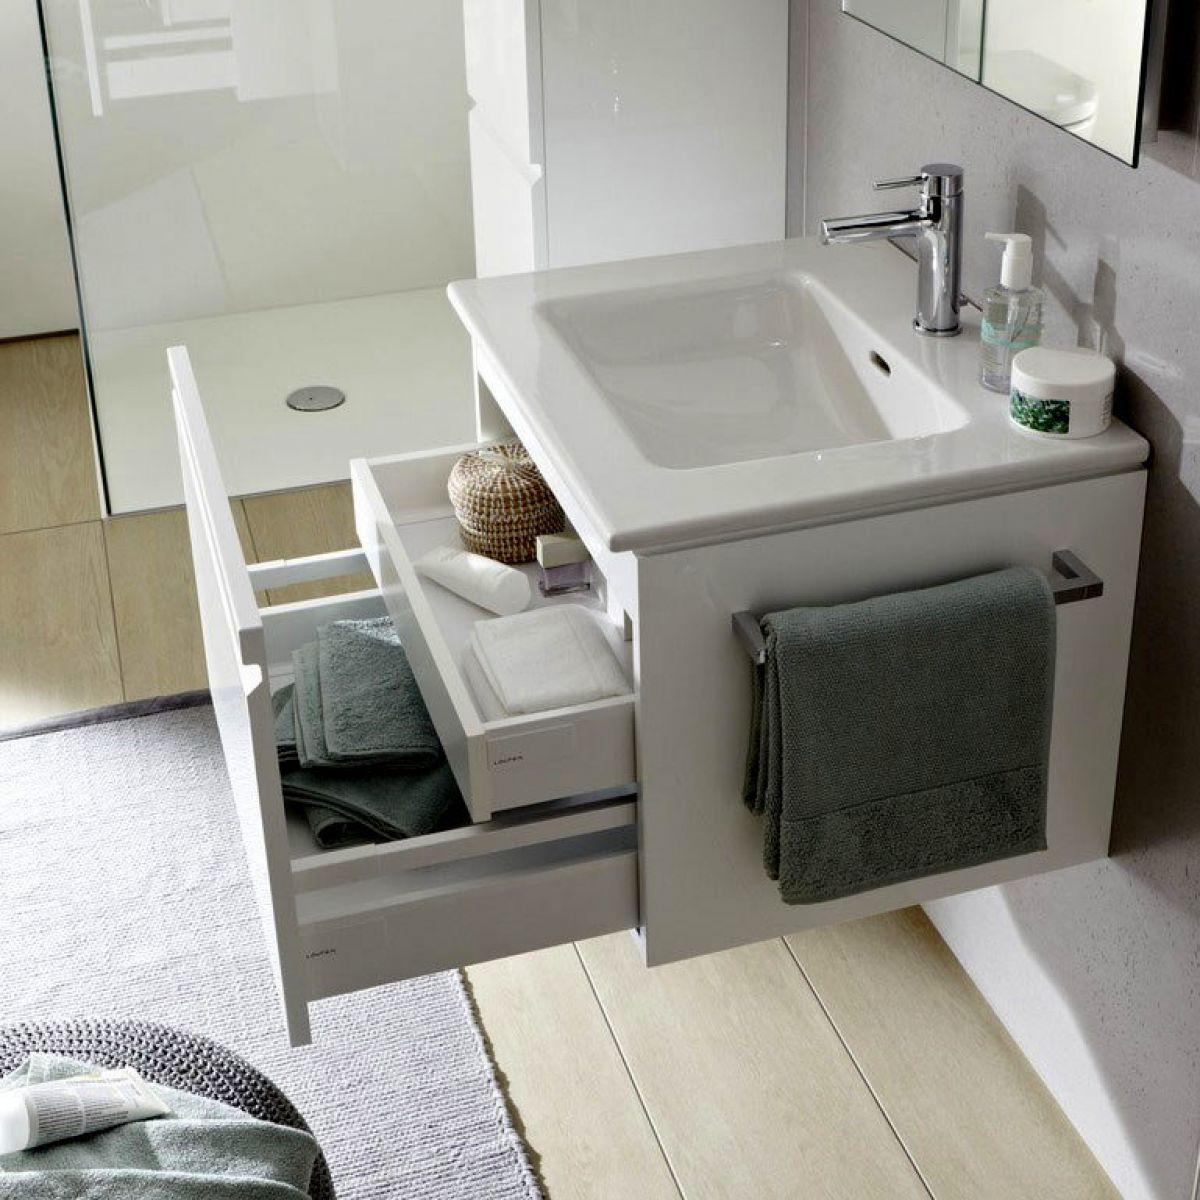 laufen pro s towel rail uk bathrooms. Black Bedroom Furniture Sets. Home Design Ideas